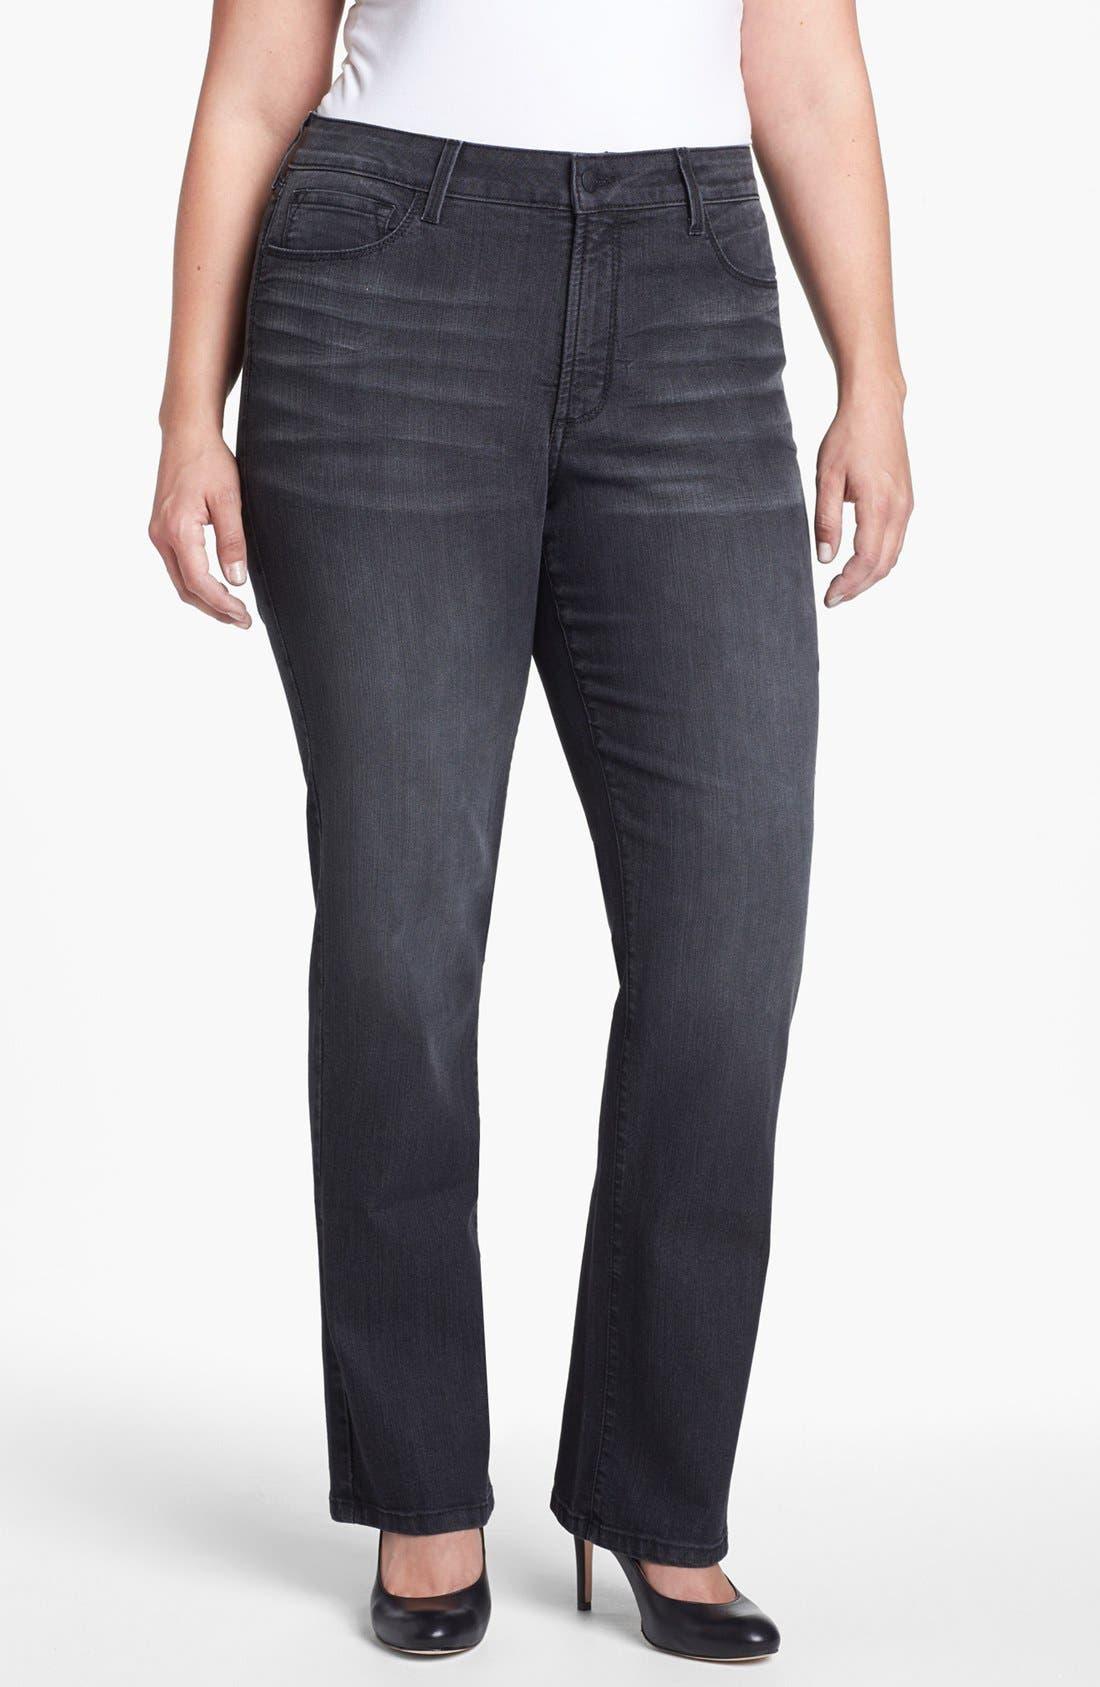 Alternate Image 1 Selected - NYDJ 'Marilyn' Straight Leg Jeans (Plus Size)